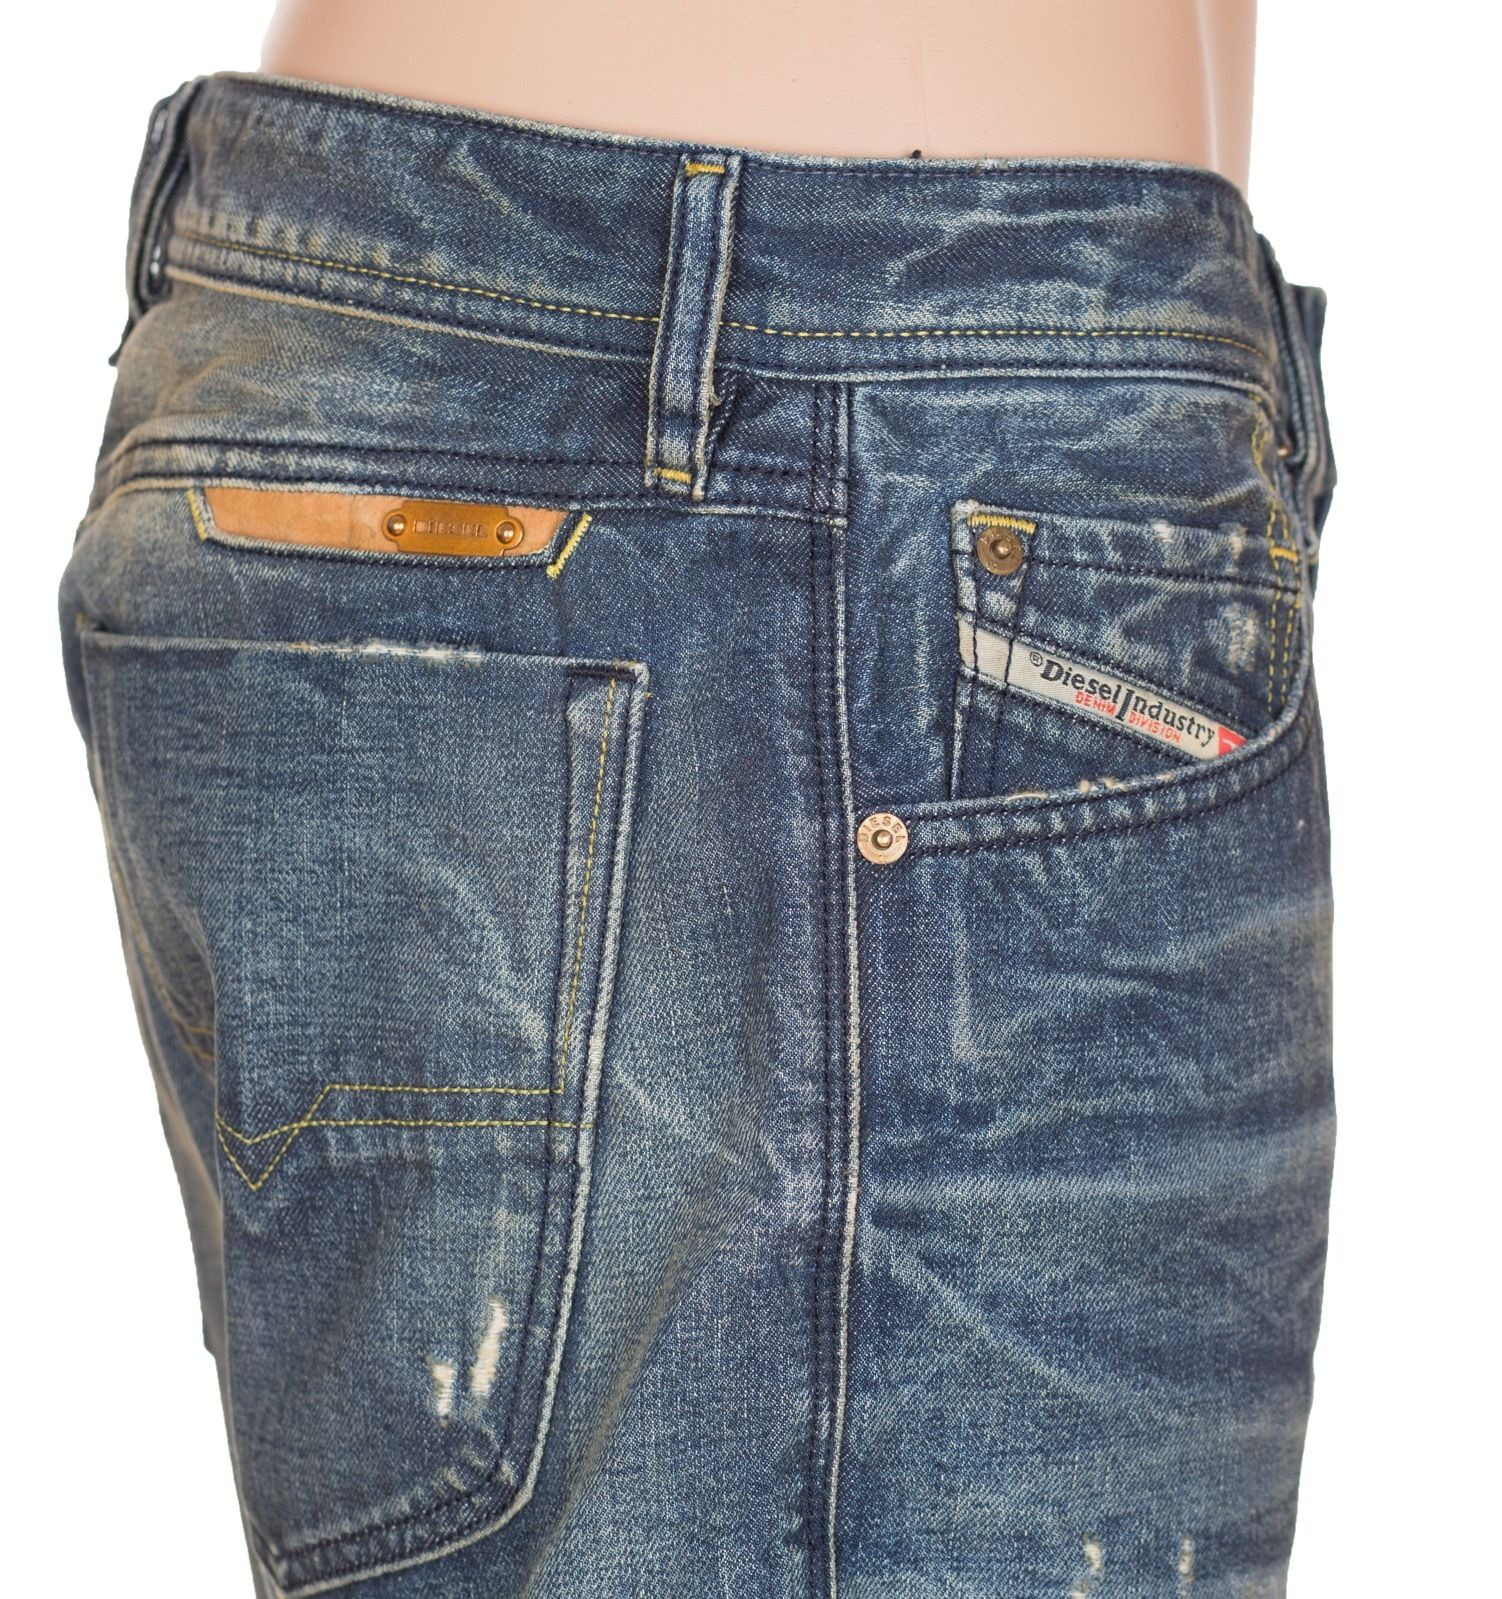 12f1c4d34fdfa Diesel Denim Jeans Bravefort Comfort Carrot Wash 0801M sz W32 L32